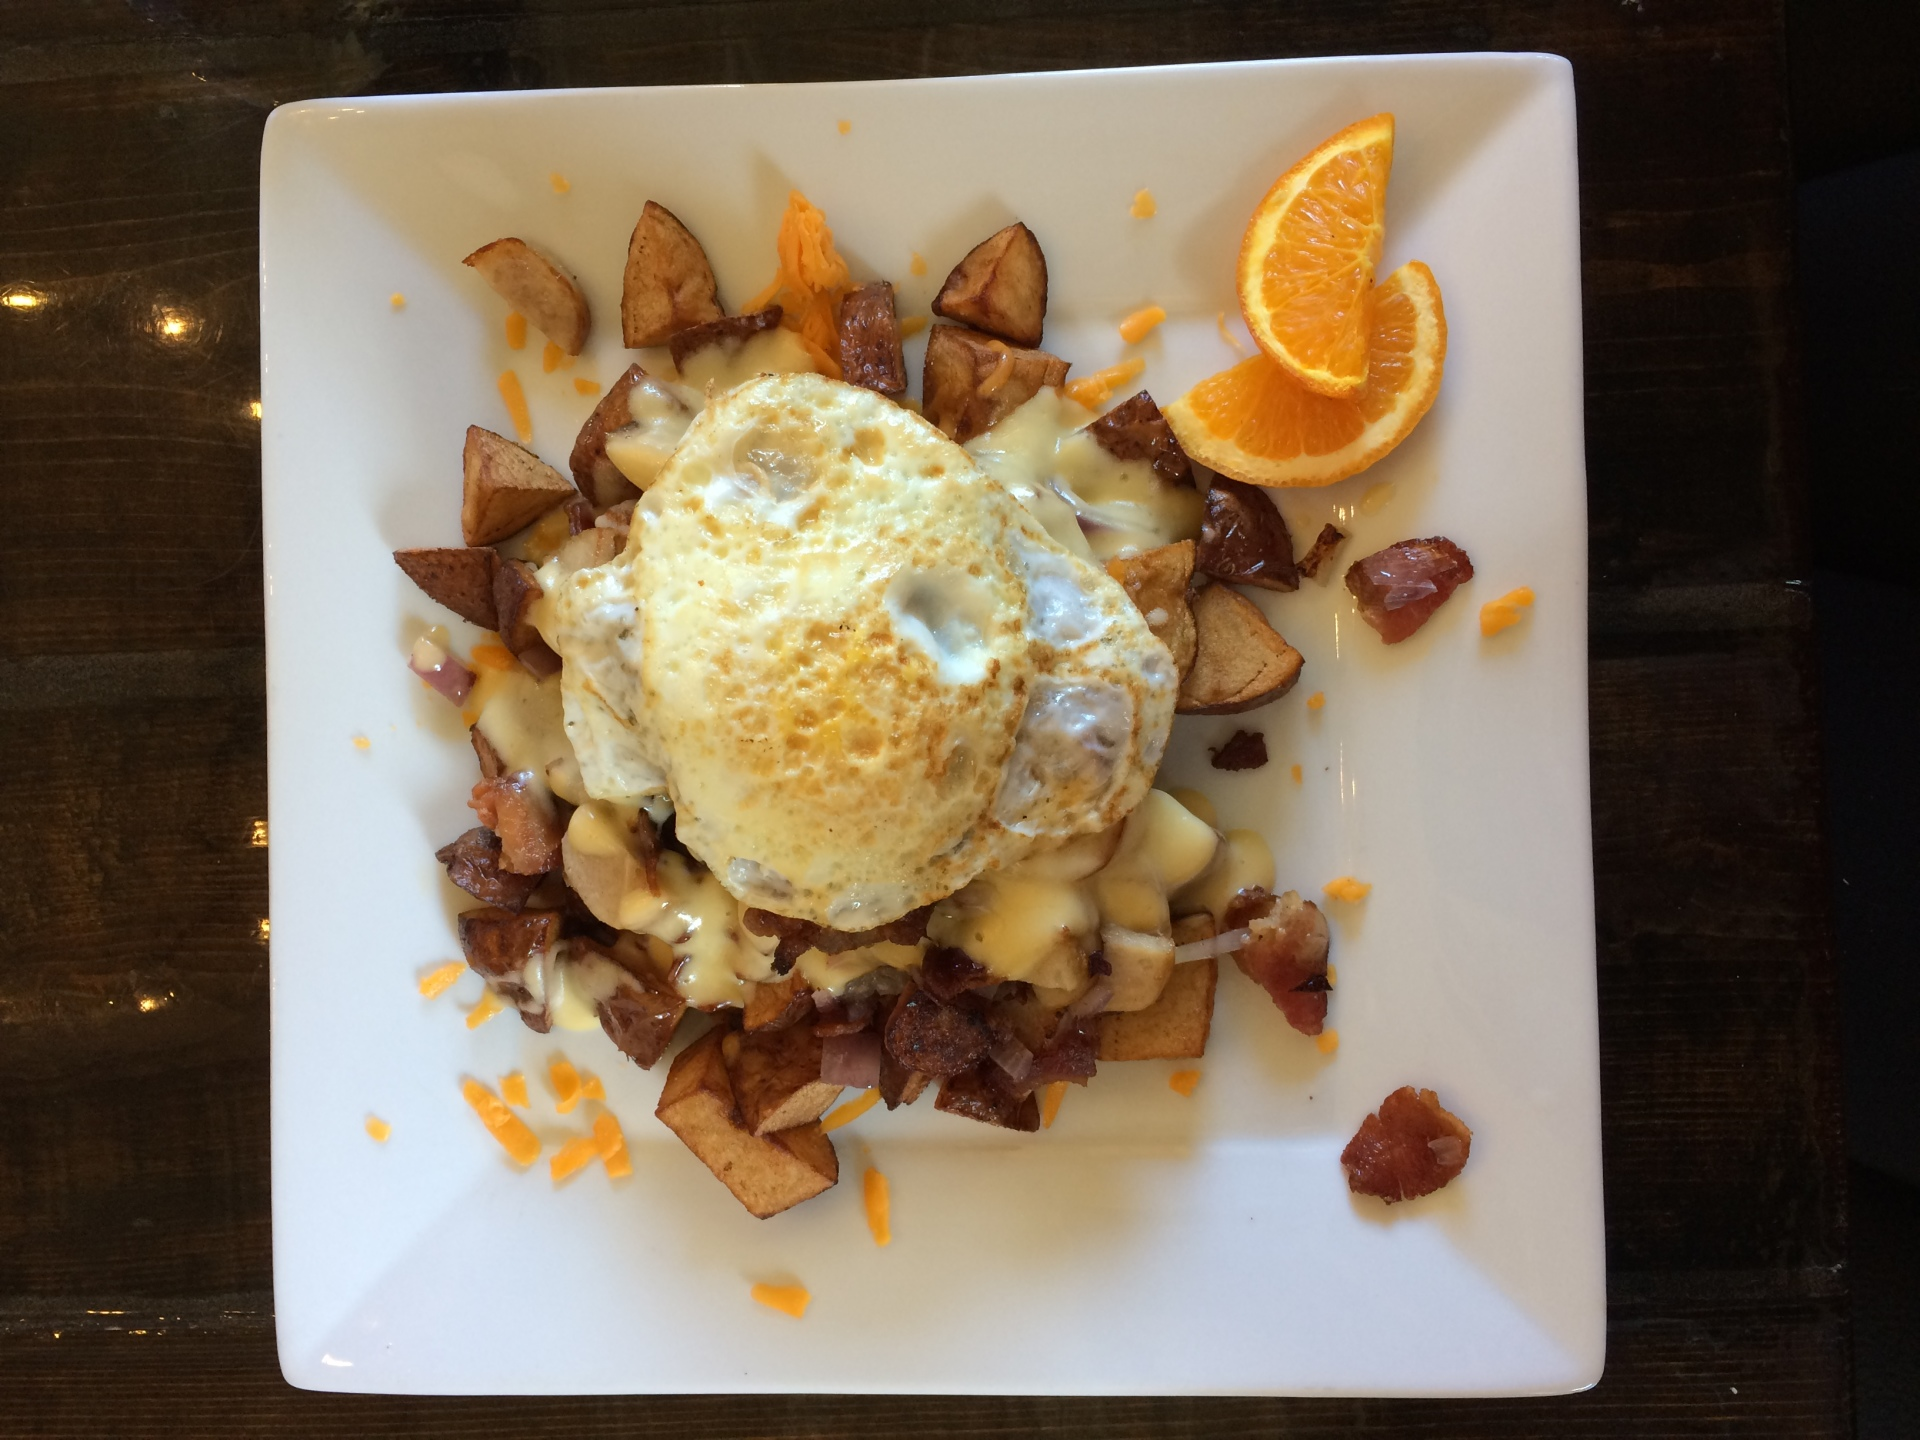 breakfast, brunch, poutine, egg, bacon, sausage, St. John's, best brunch in St. John's